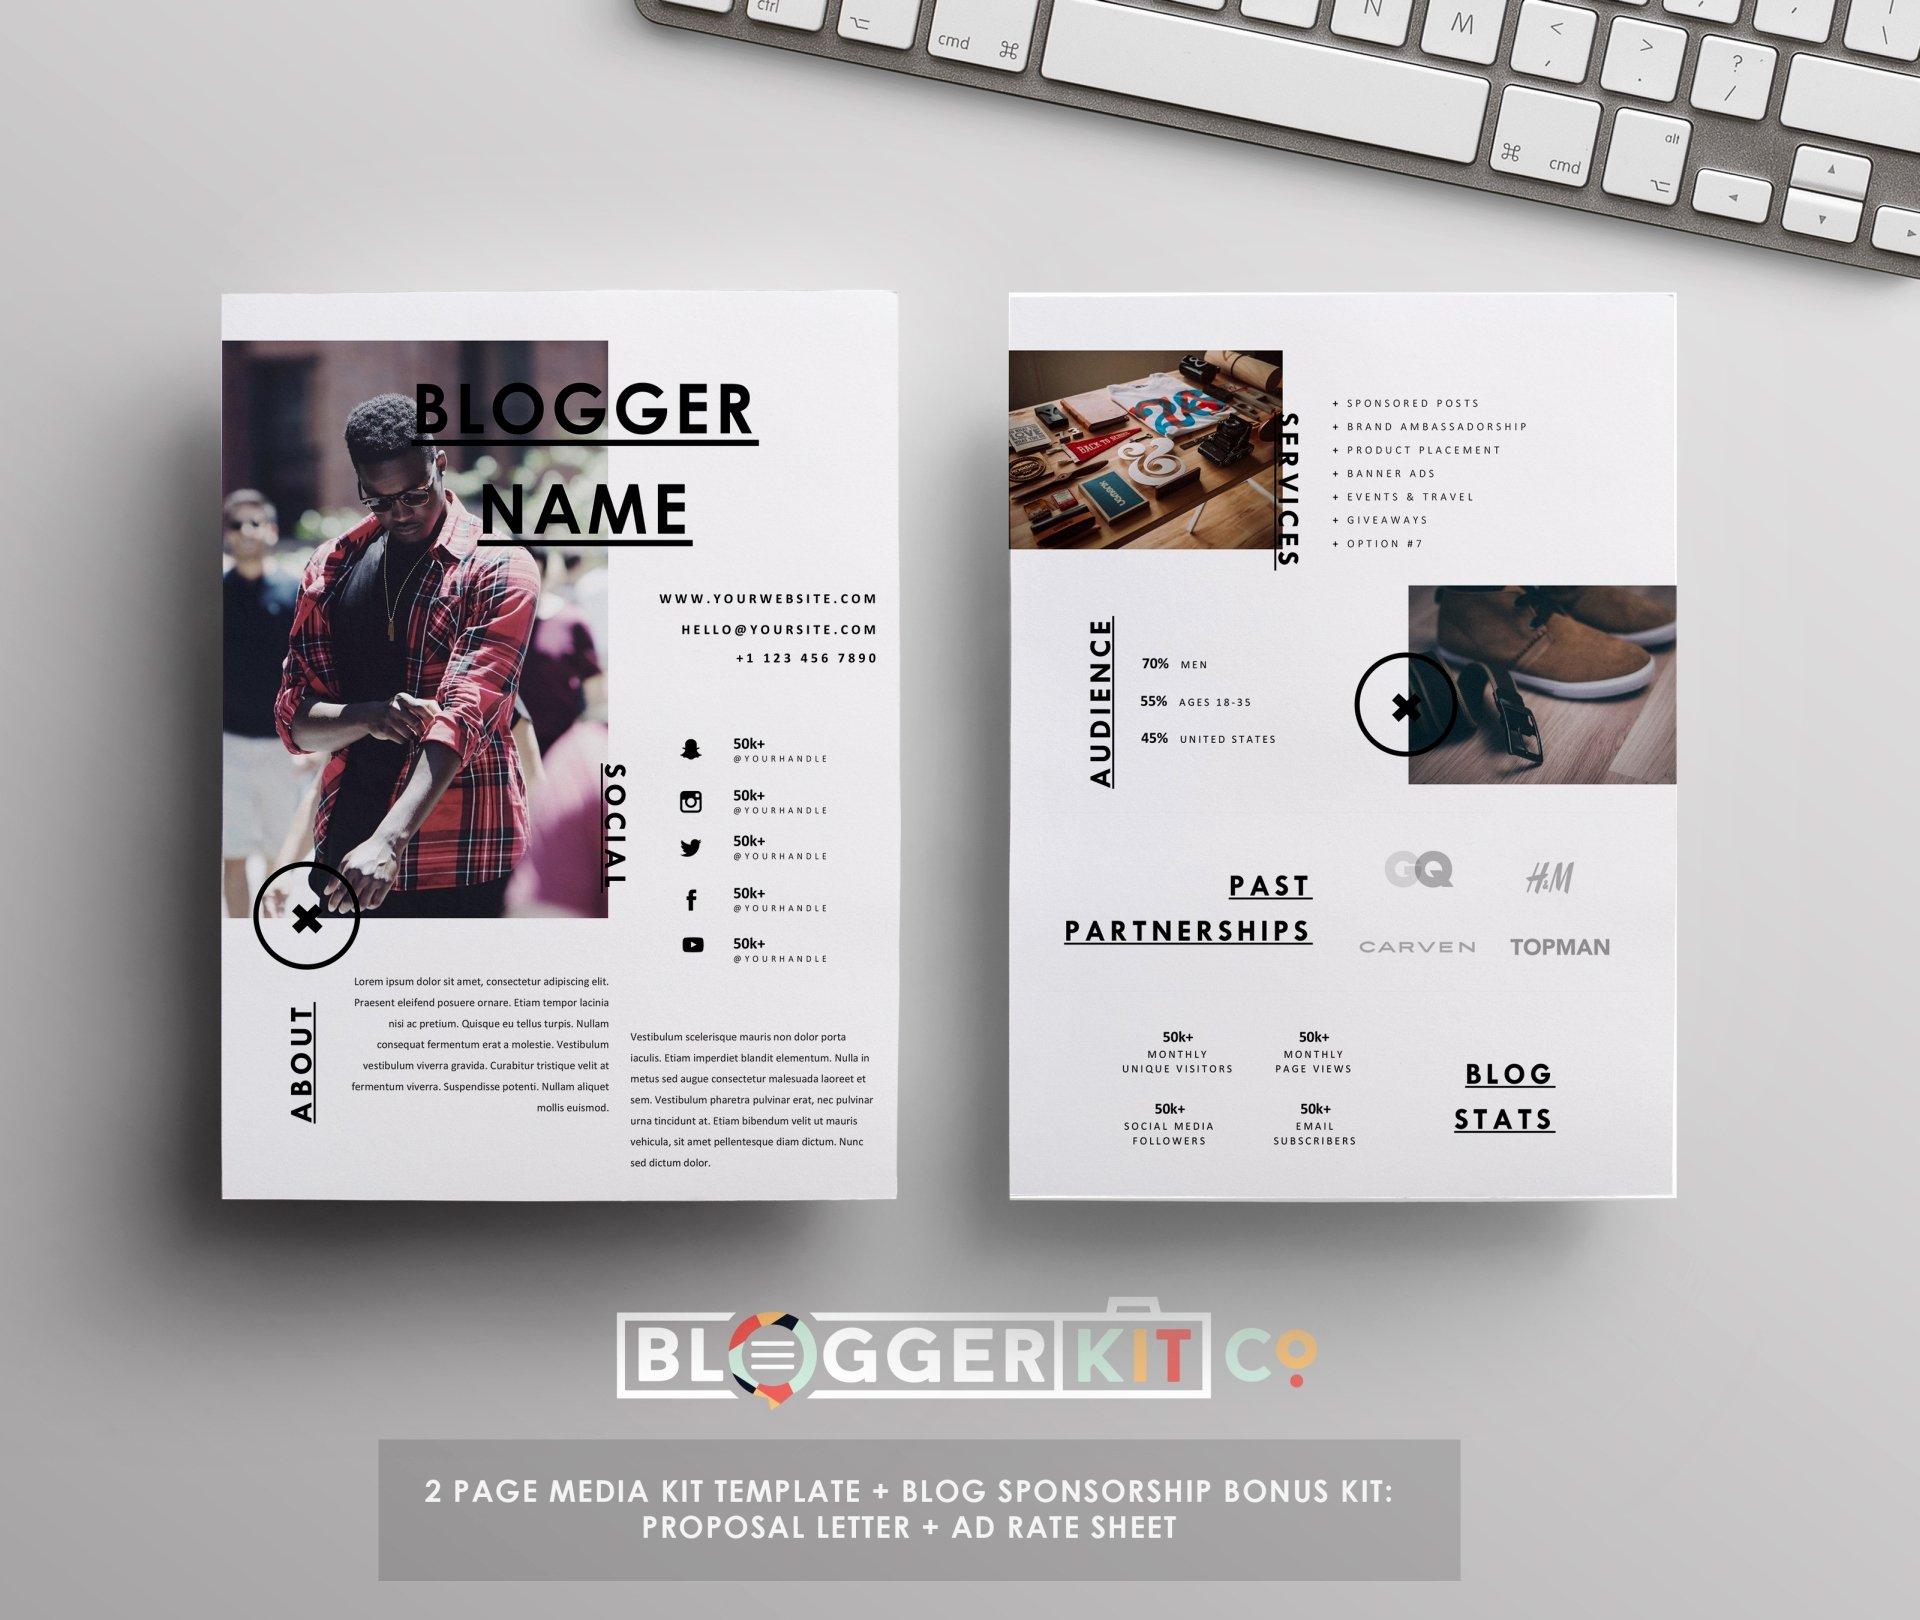 Free Press Kit Template Lovely Influencer Media Kit Template Ad Rate Sheet Blog